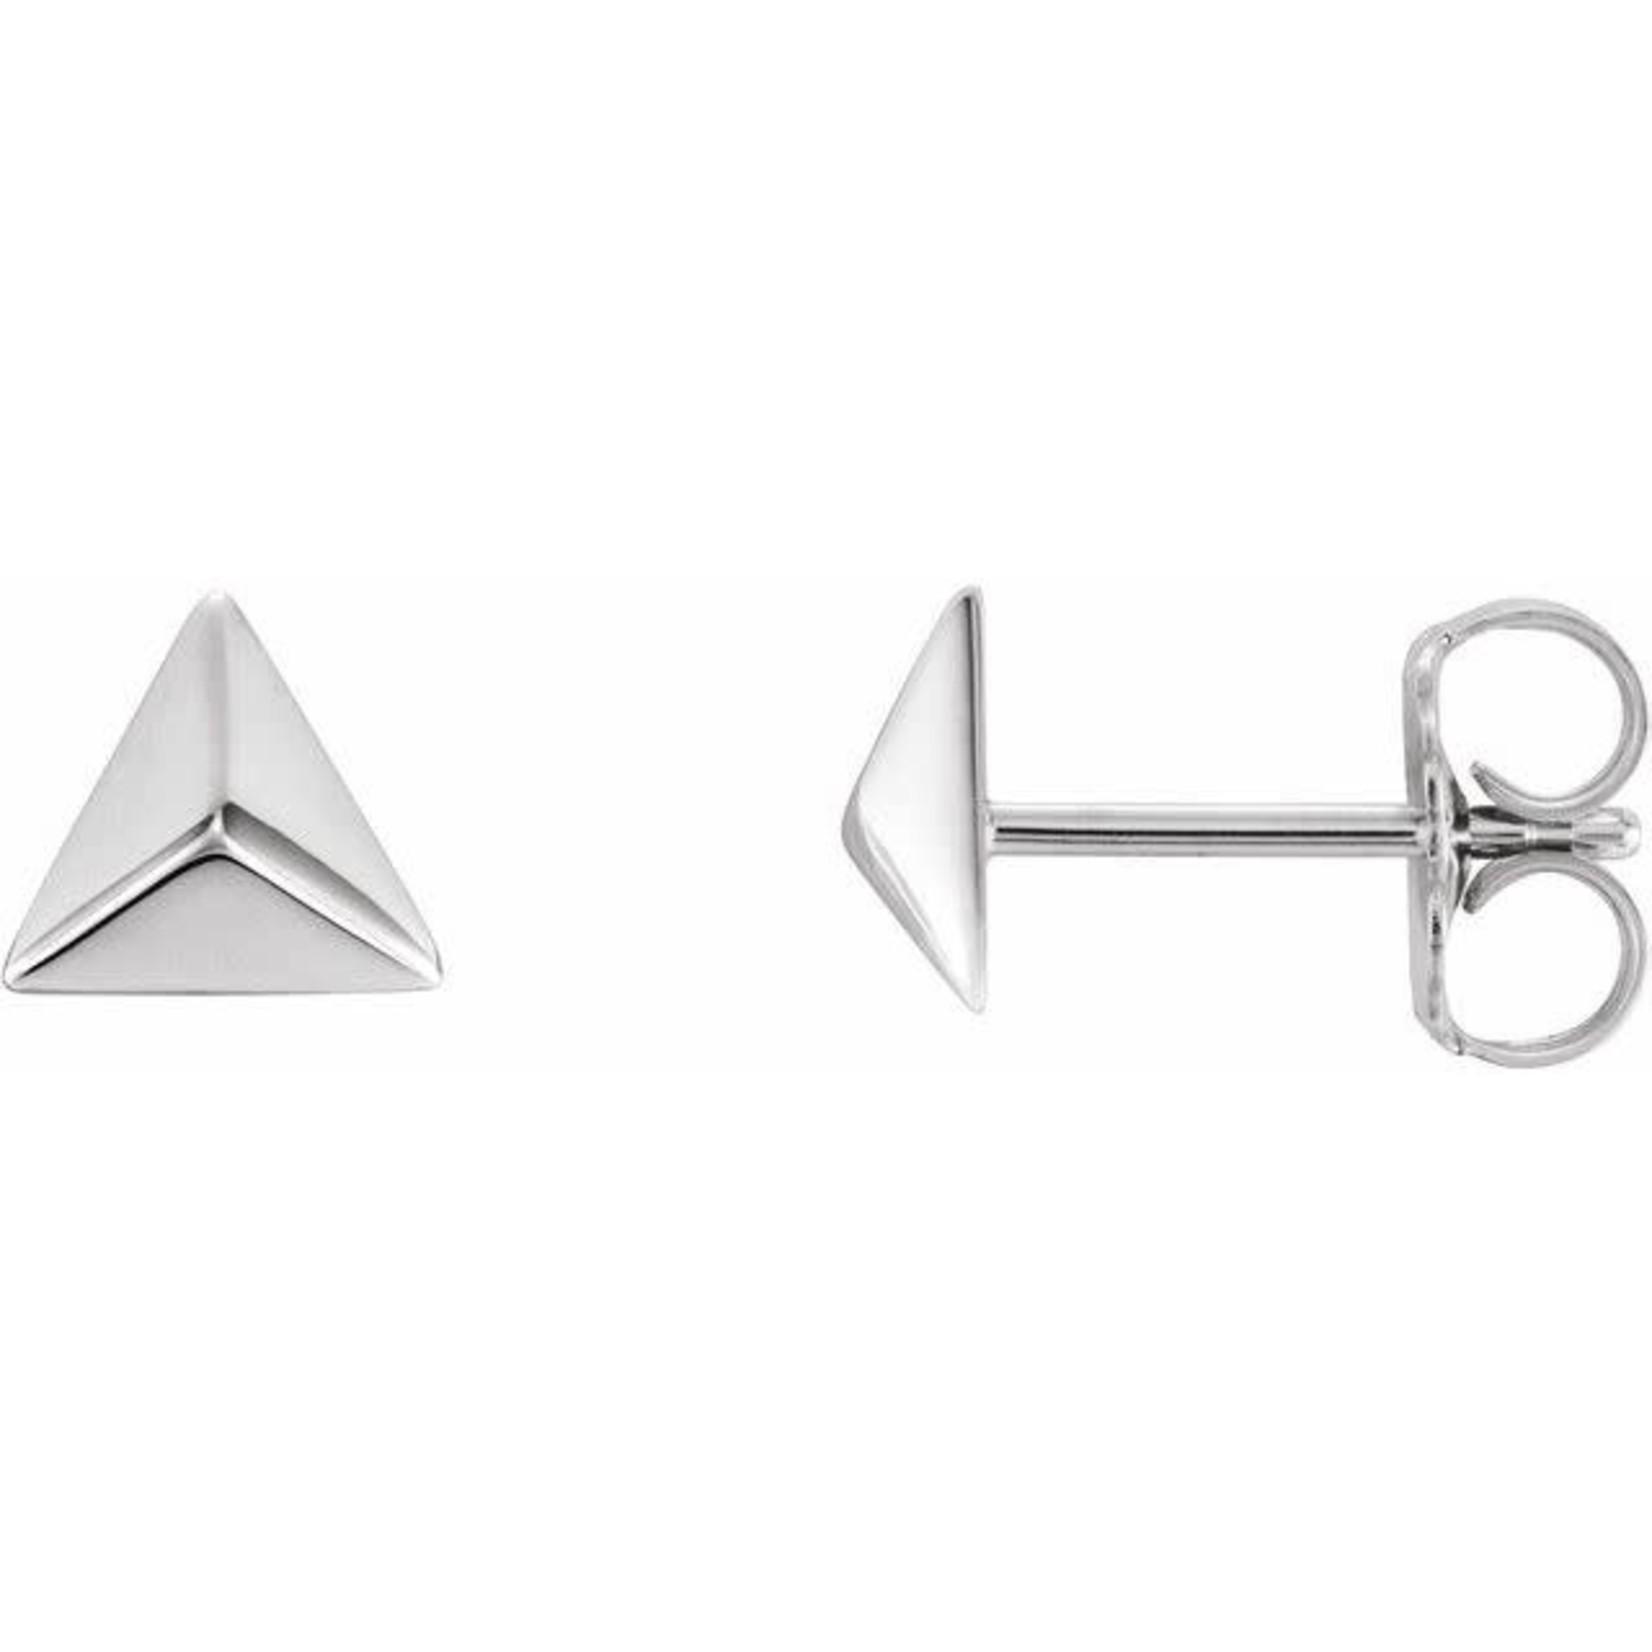 Sterling Silver Mini Pyramid Stud Earrings